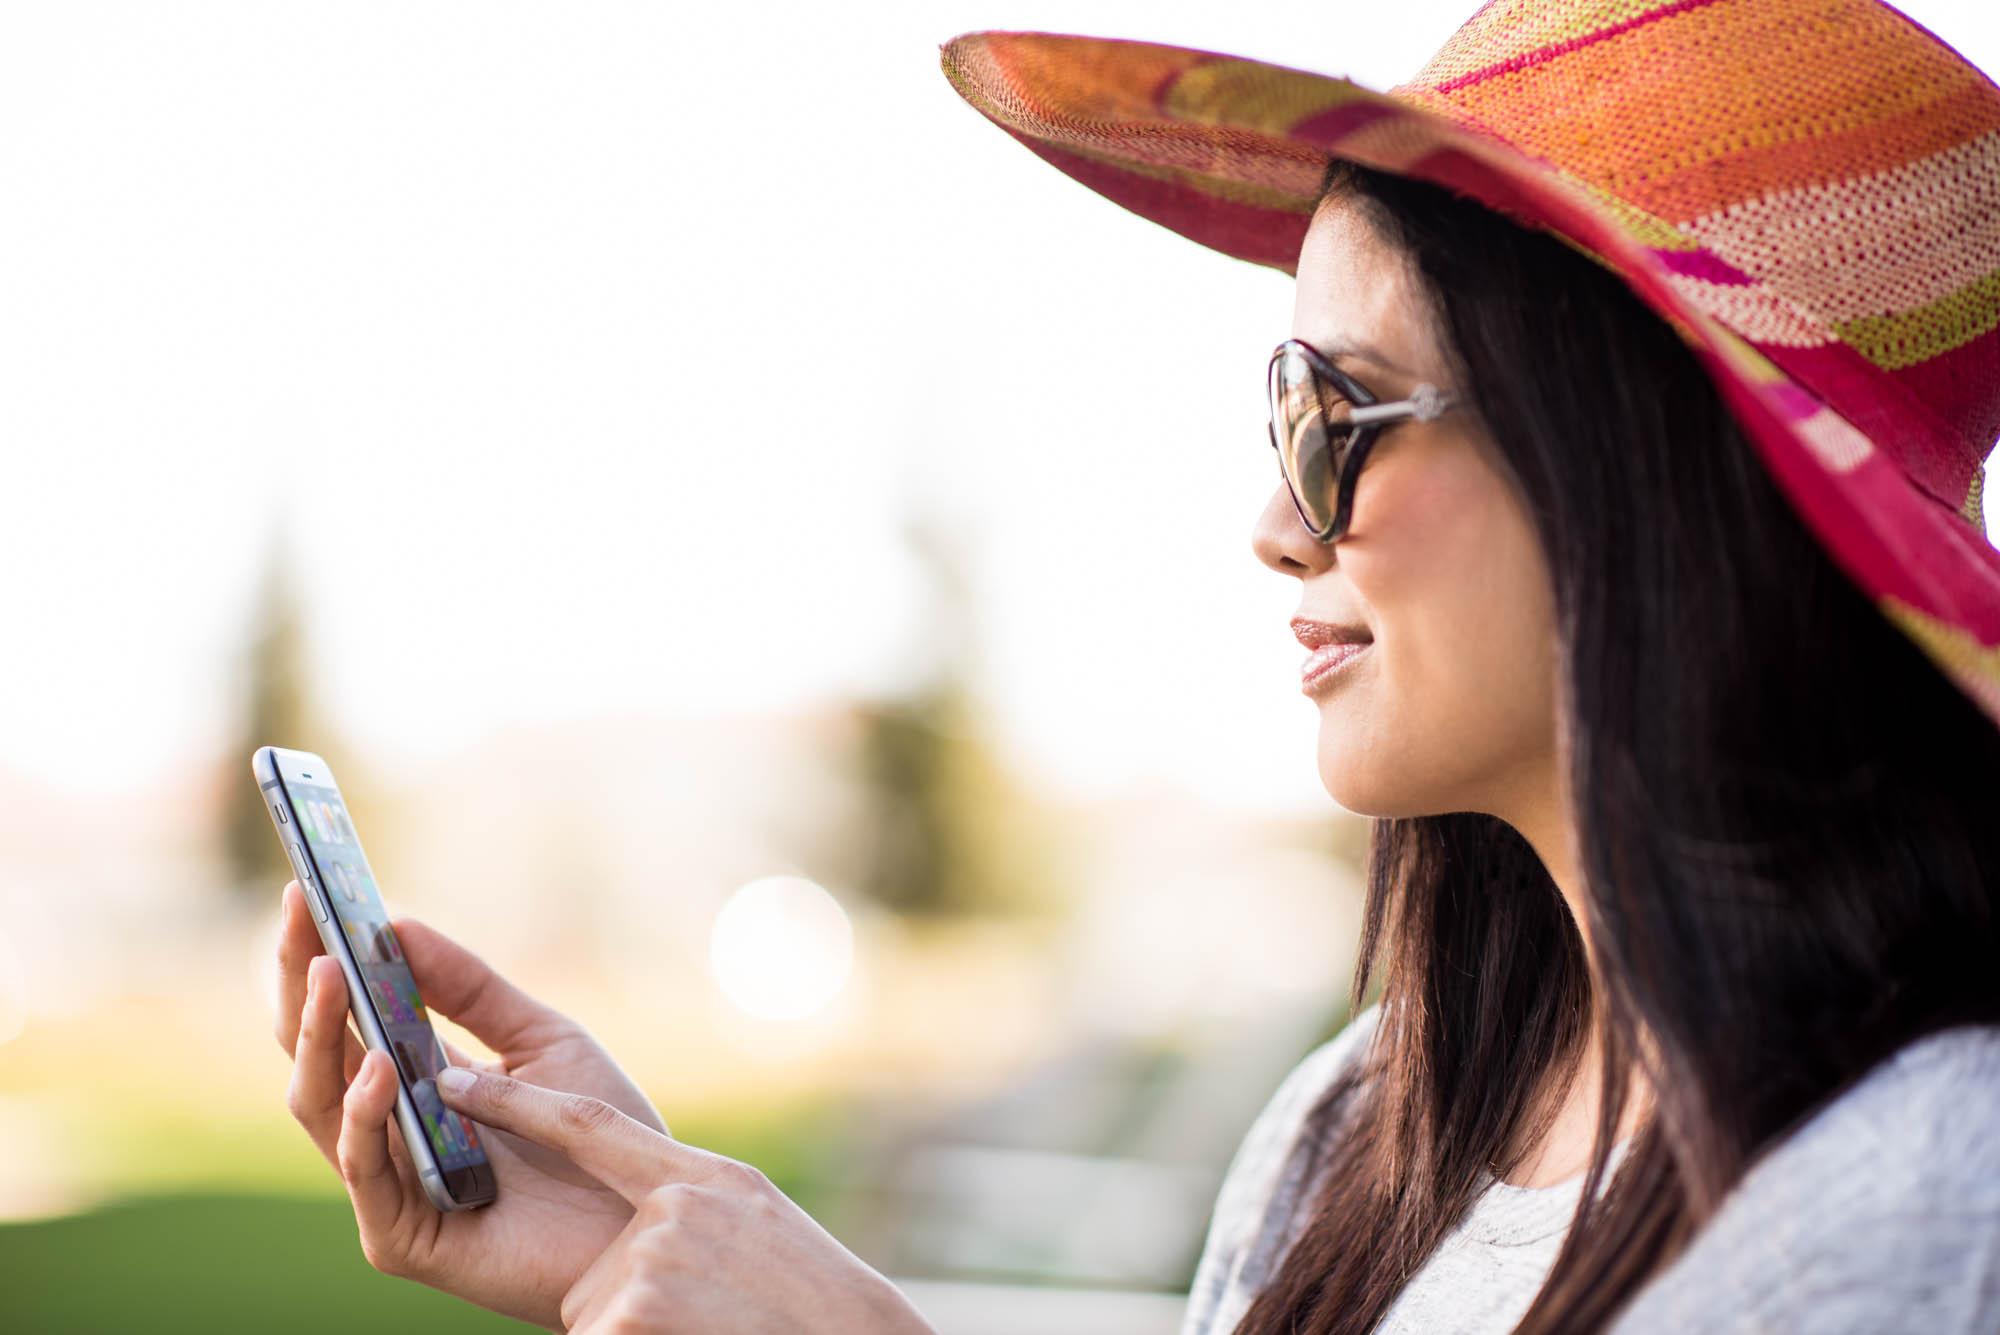 Girl-using-phone-Jordan-Reeder.jpg